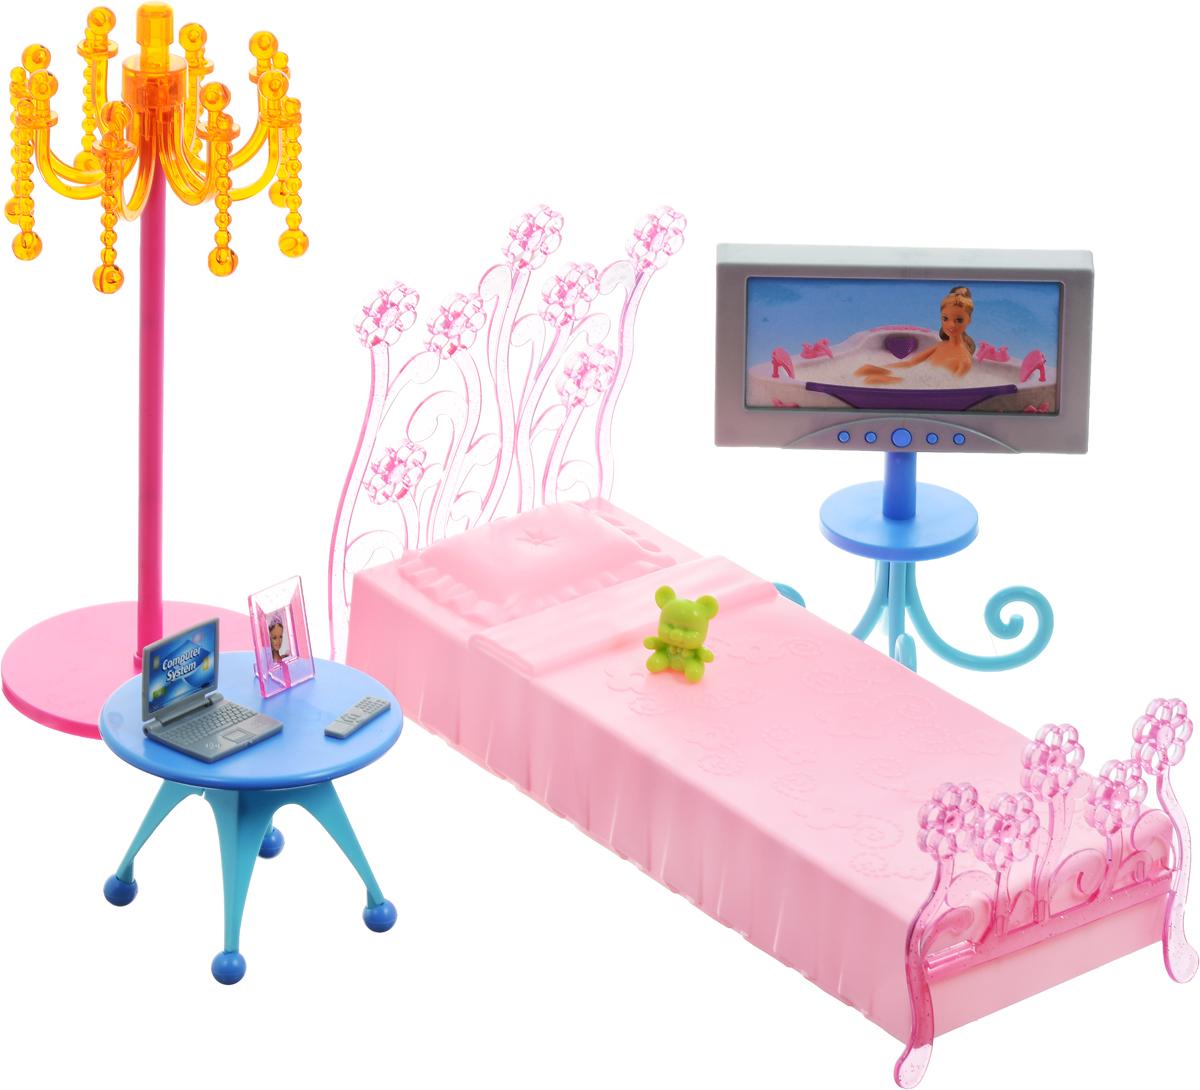 1TOY Мебель для кукол Спальня 1toy 1toy карета с лошадью для кукол 1 местн т53235